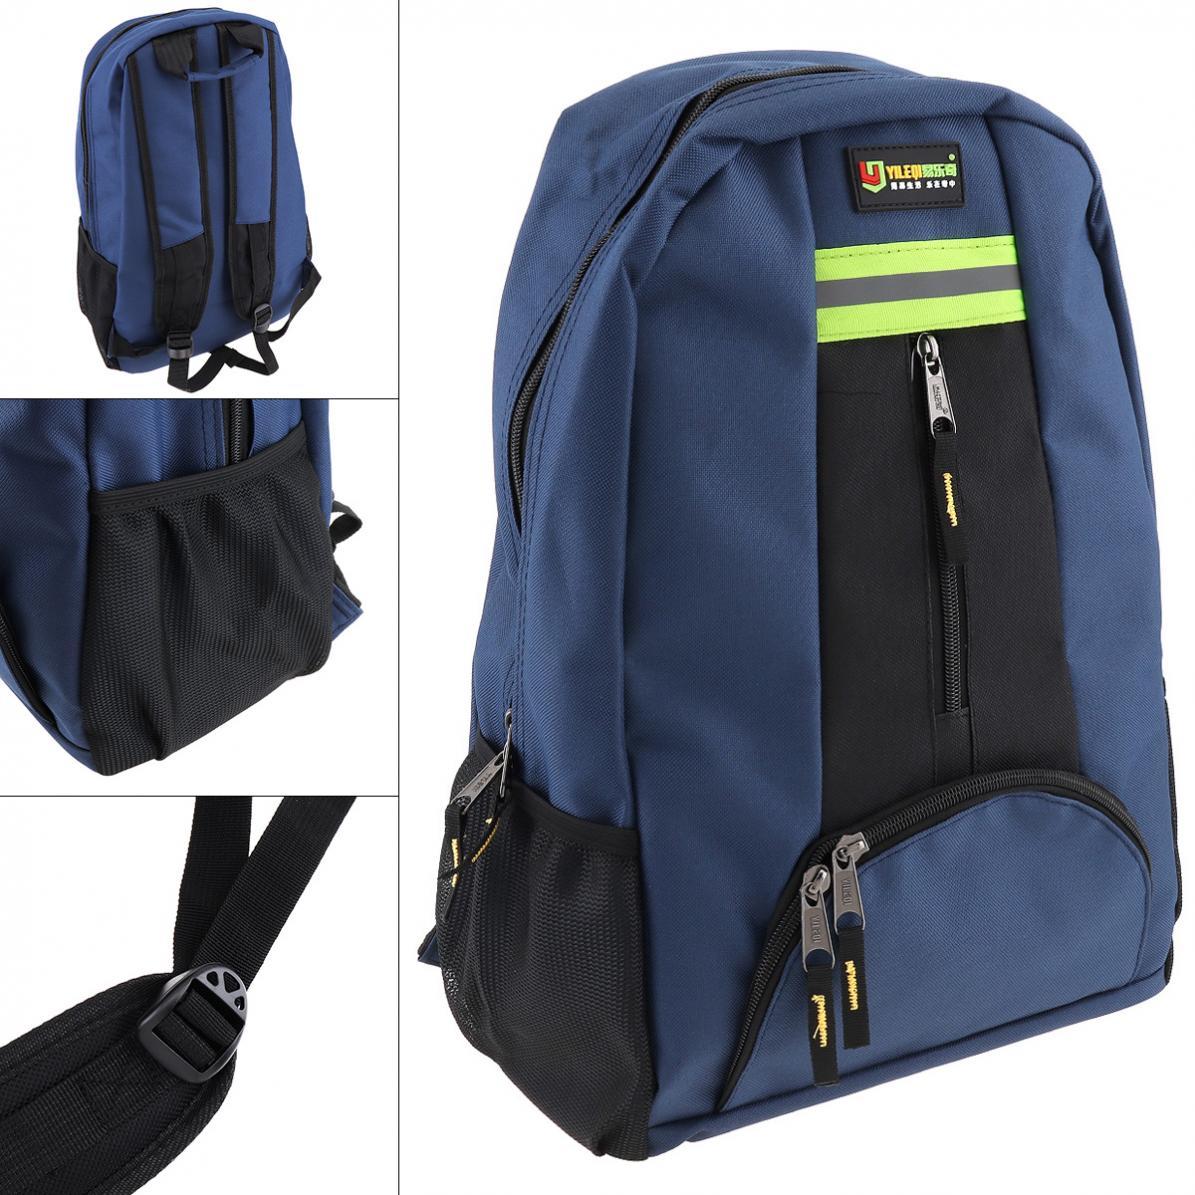 Backpack-Tool-Bag Maintenance-Tools 12-Pockets Multifunctional Double-Shoulder Cloth